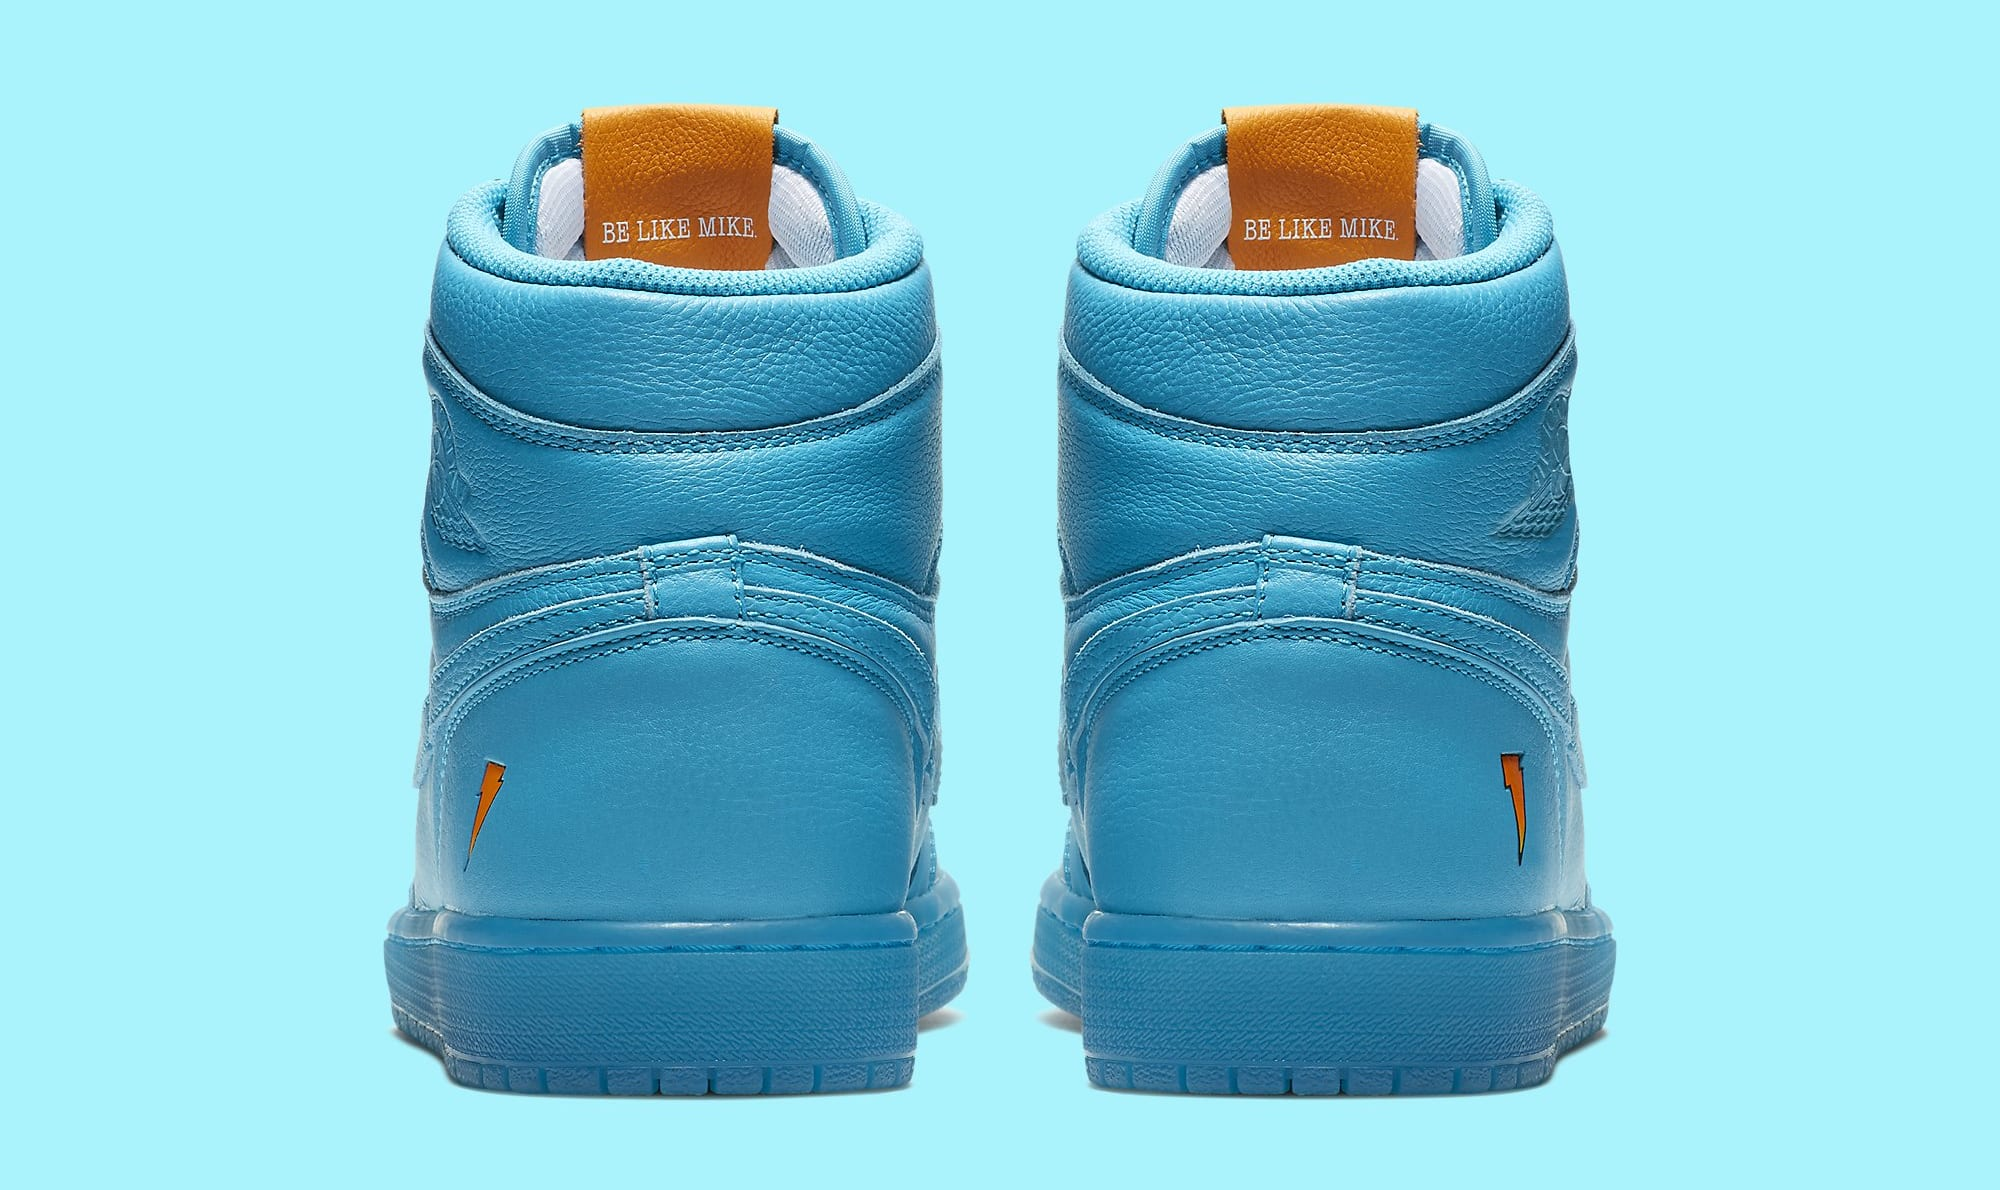 ... Image via Nike Air Jordan 1 High Gatorade Blue Lagoon AJ5997-455 ... 9e306f9f0